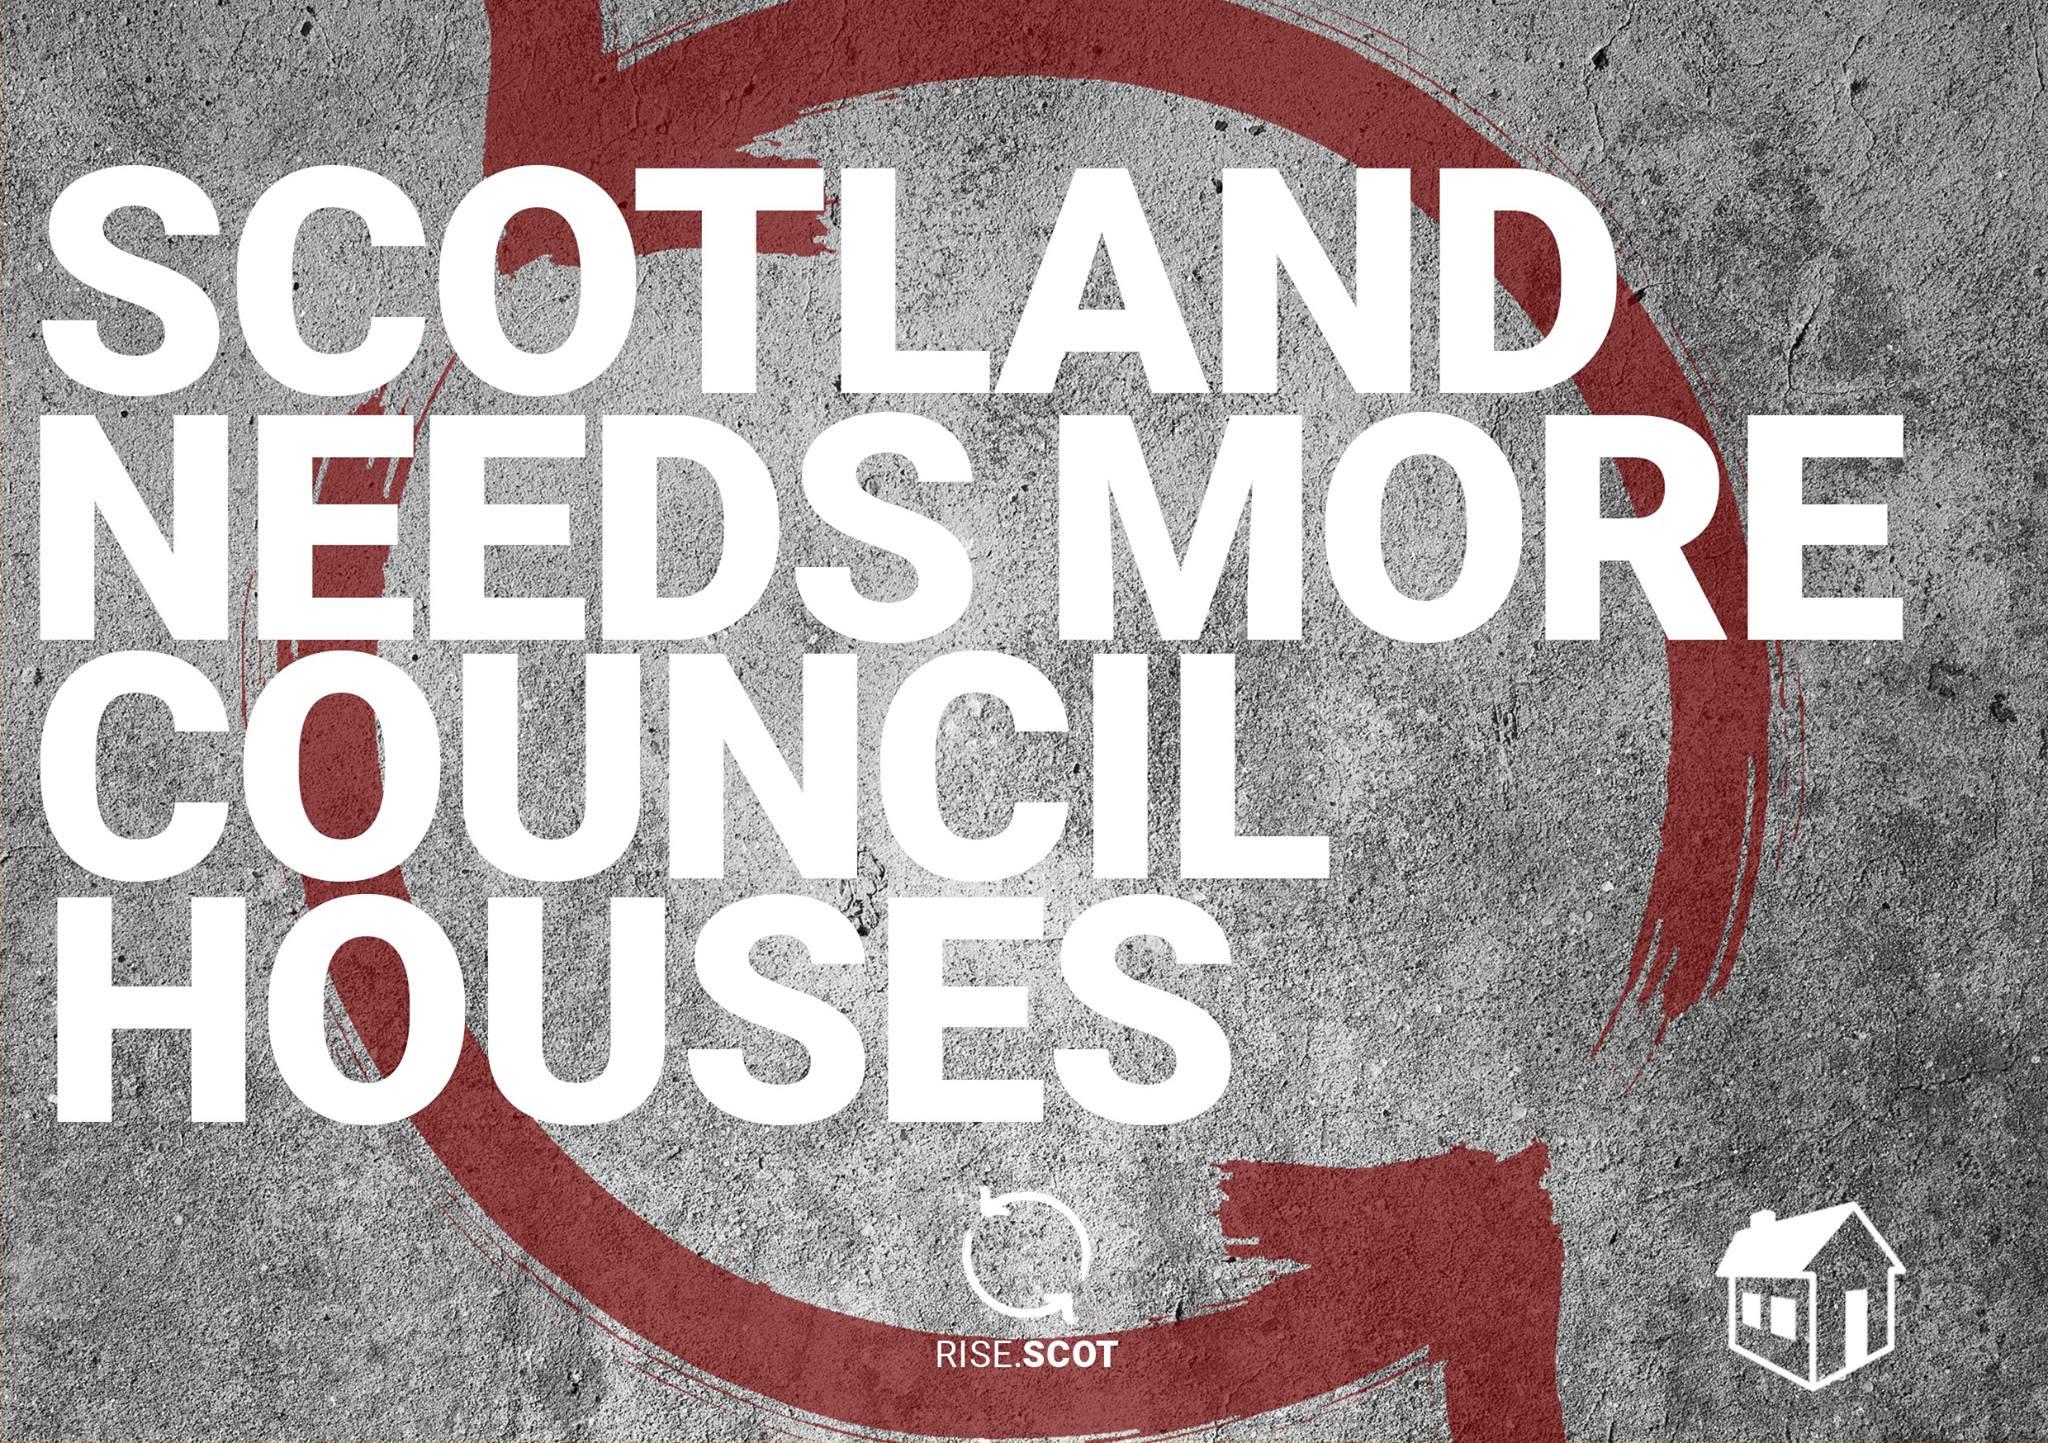 Scotlandneedmorecouncil houses.jpg